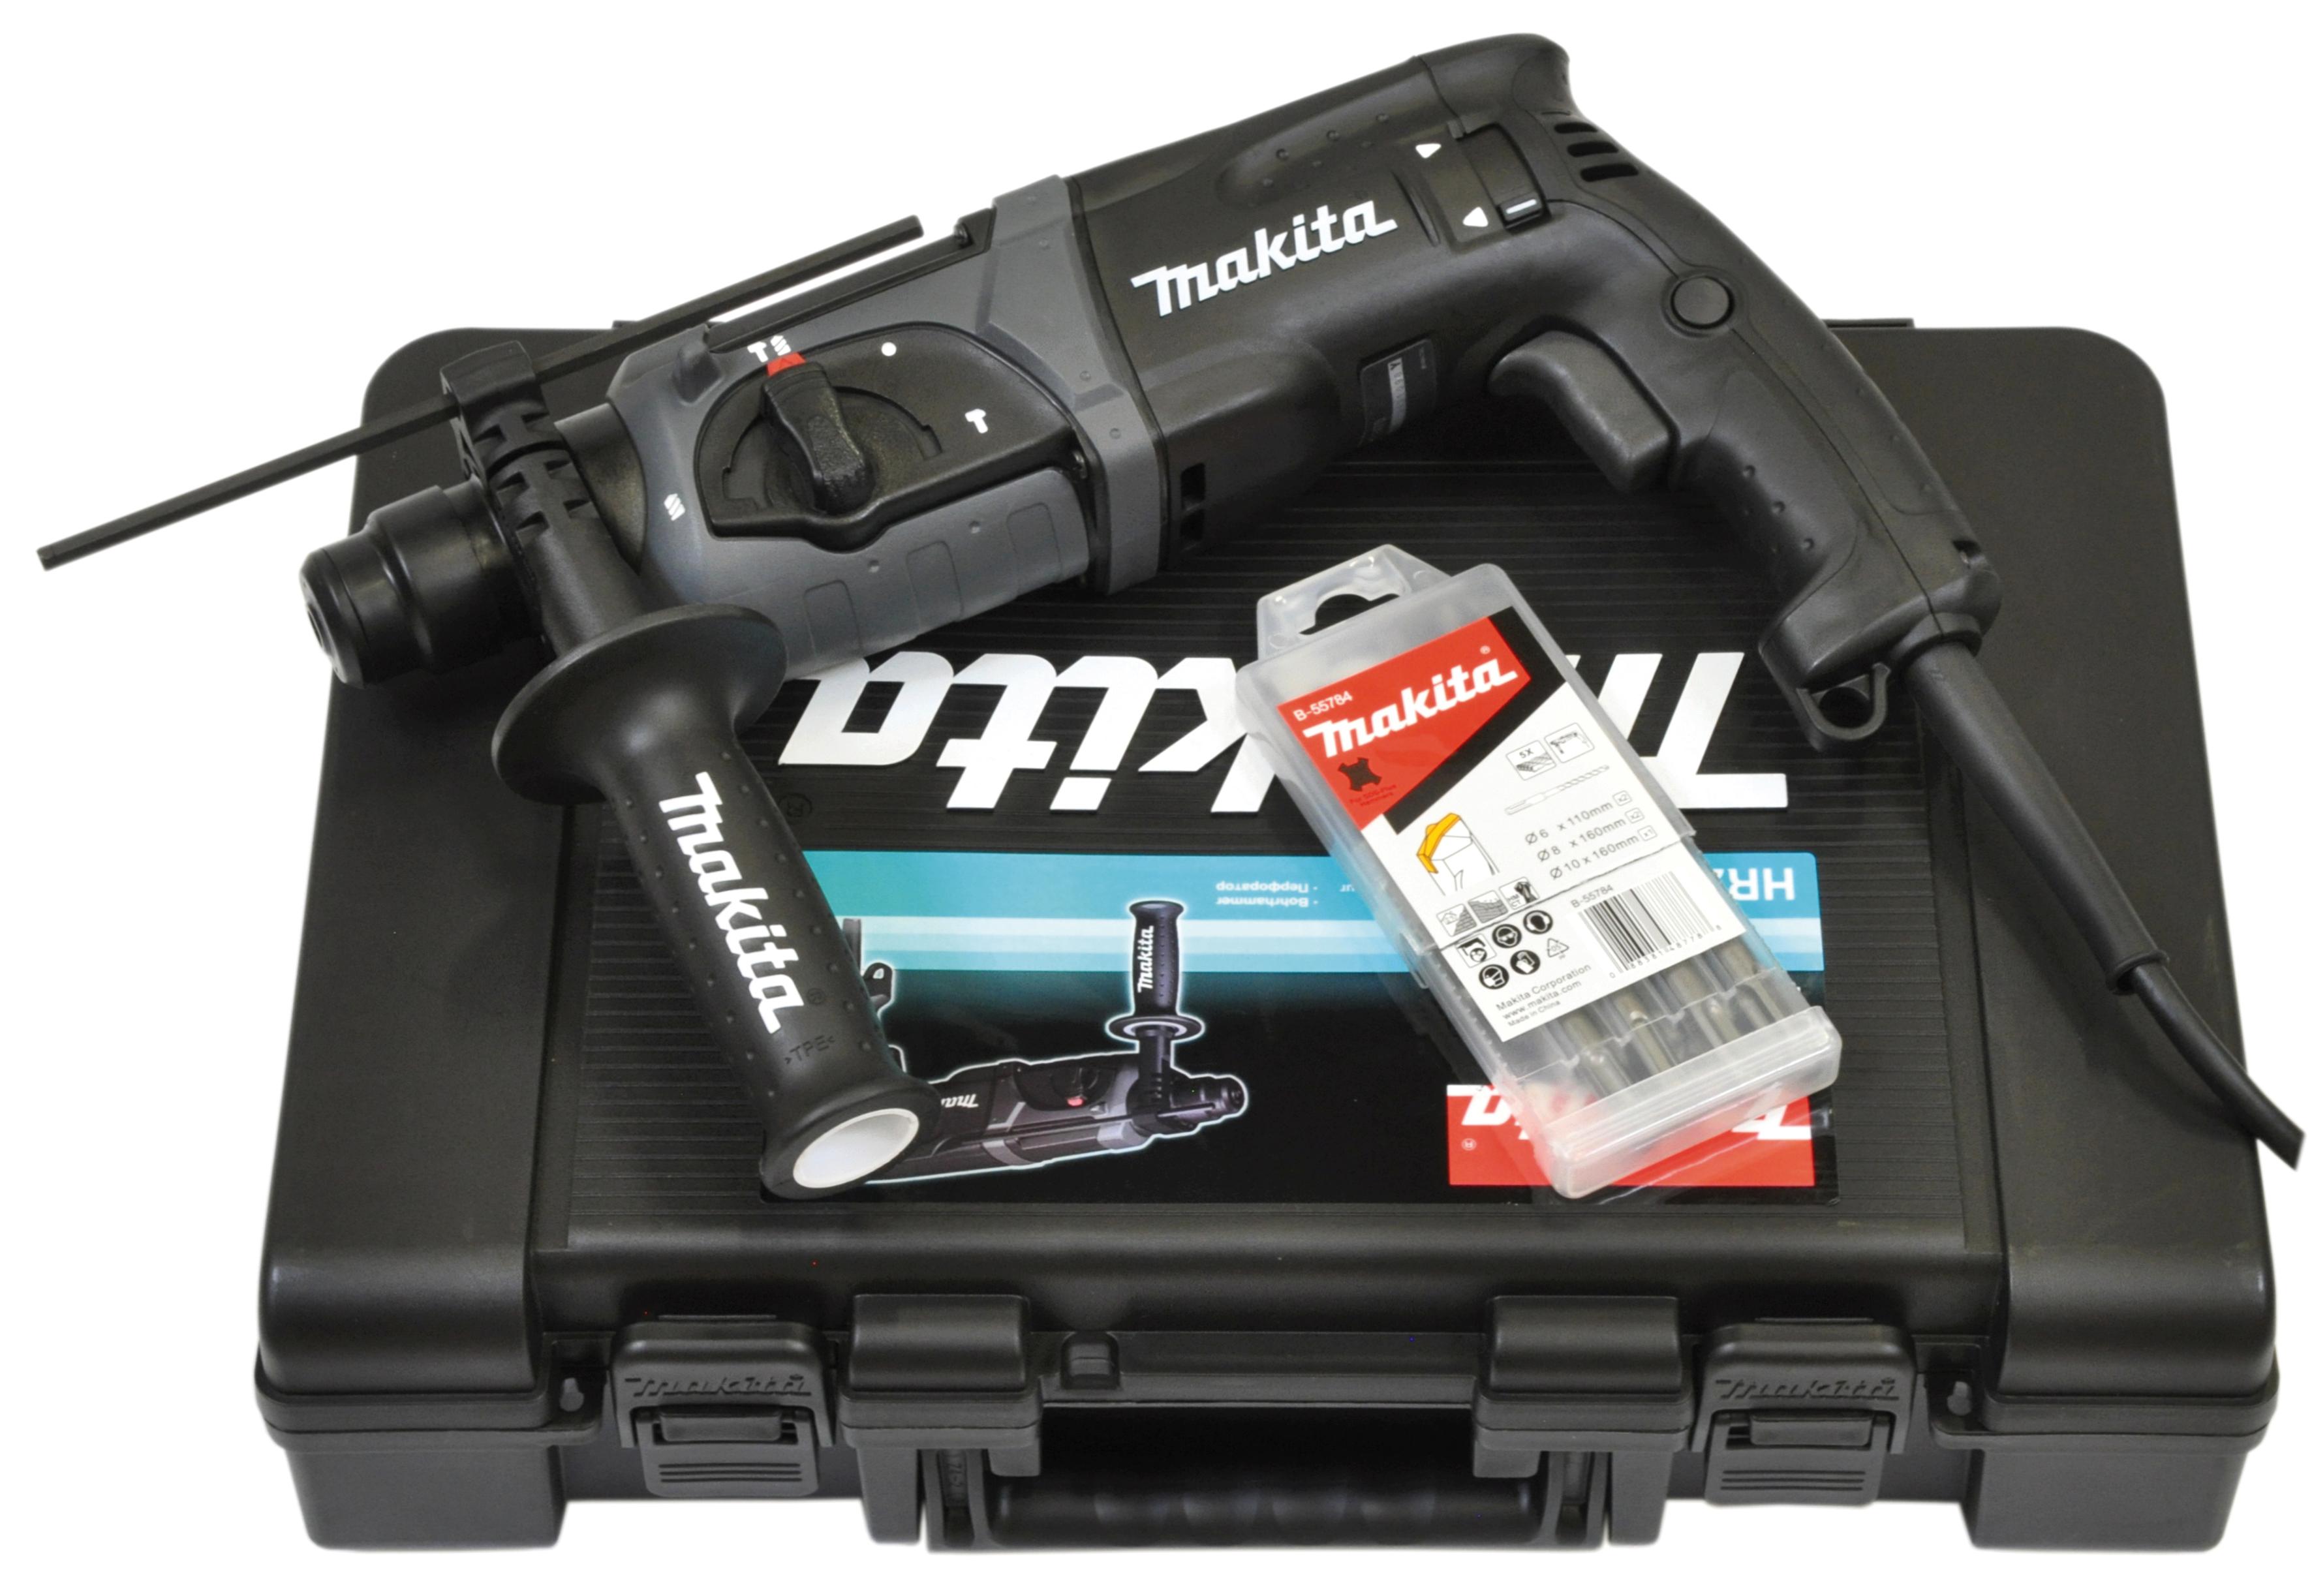 Makita Entfernungsmesser Junior : Makita entfernungsmesser xxl neue produkte im cbdirekt profi shop